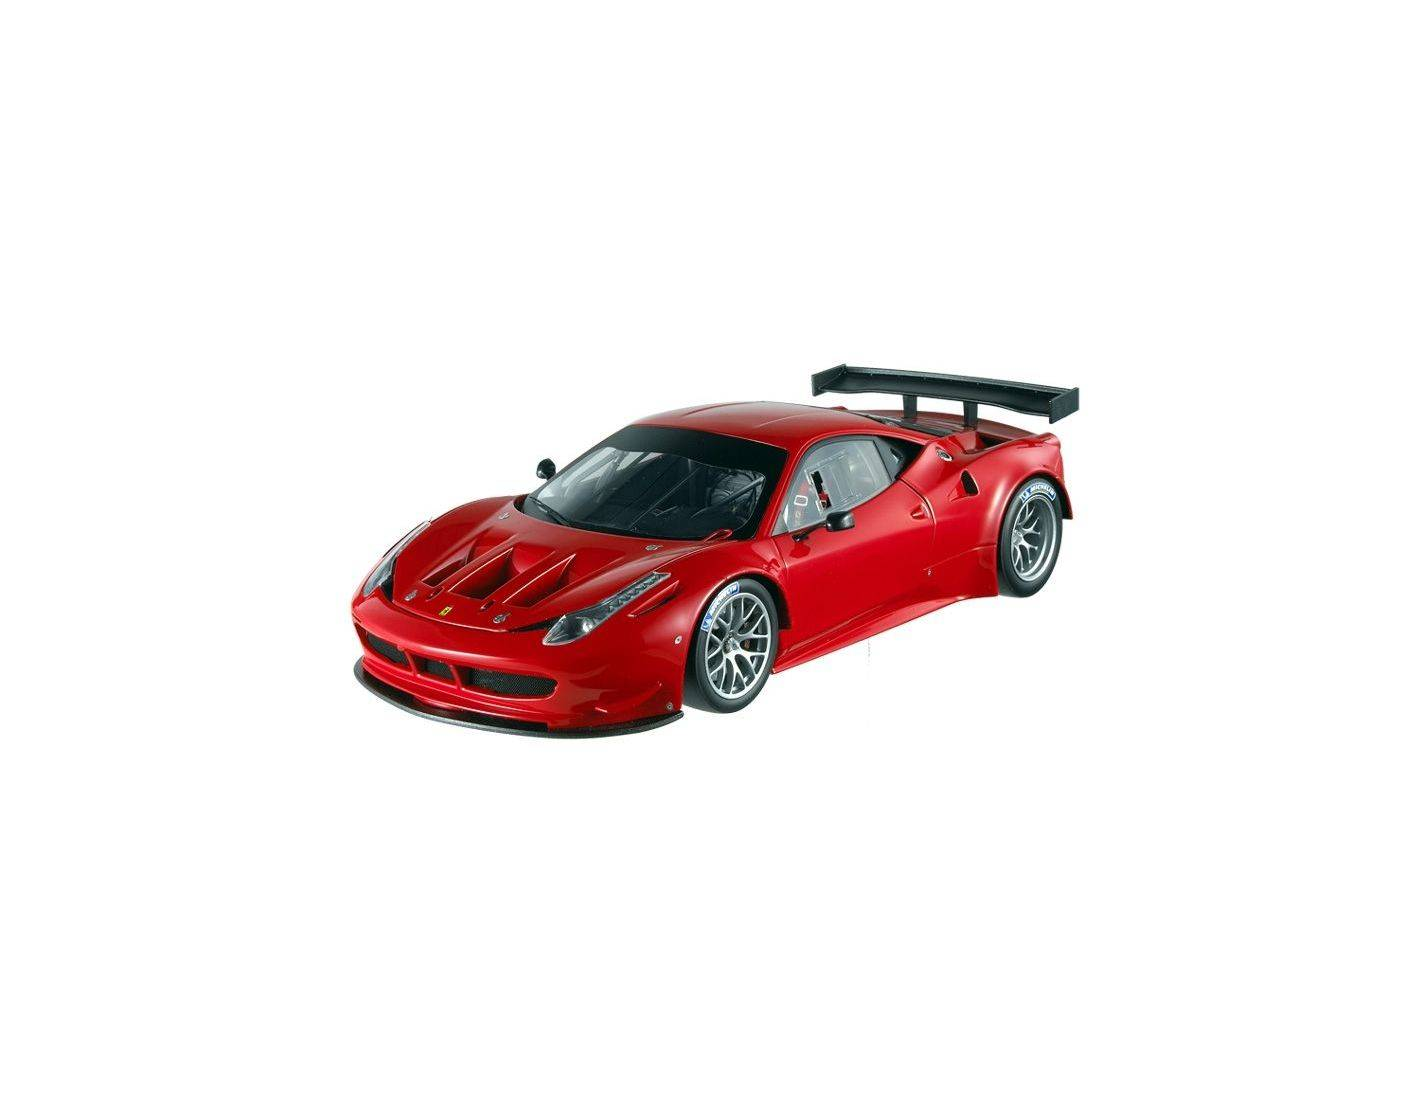 Hot Wheels Elite 2860 Mattel Ferrari 458 Italia GT2 1:18 Modellino